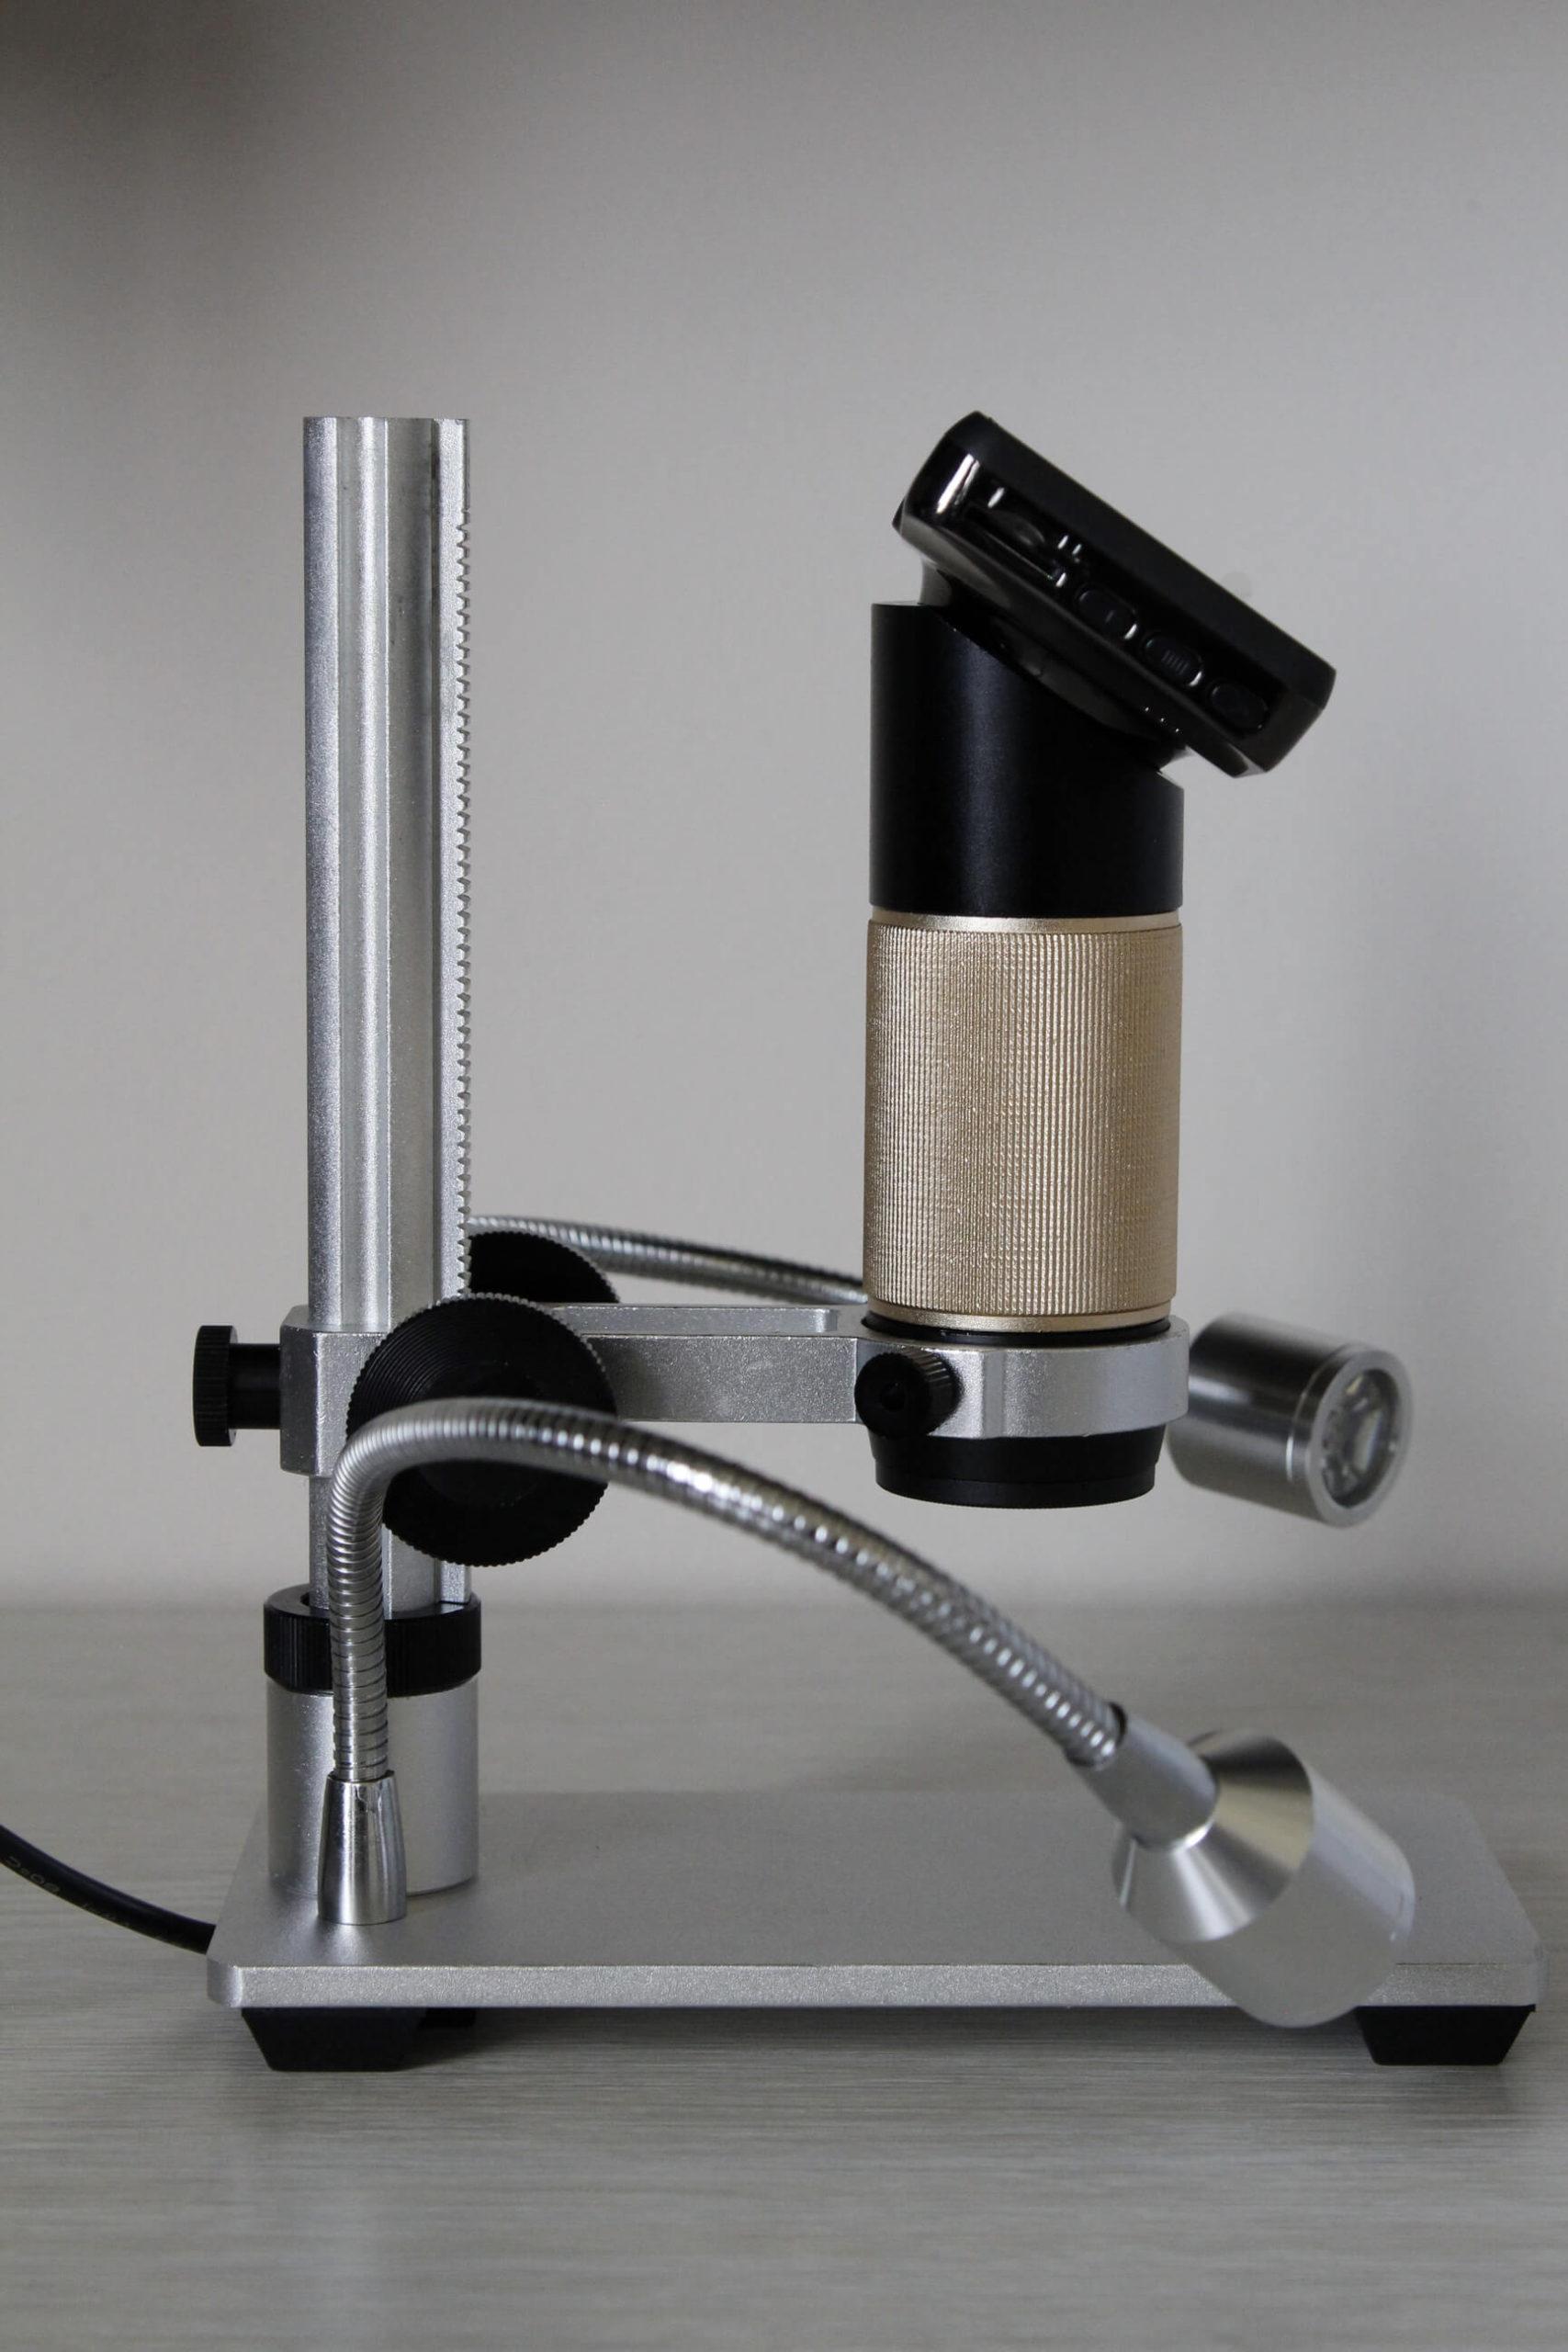 Andonstar-ADSM201-2 - Ultimate 3D Printer Nozzle Comparison